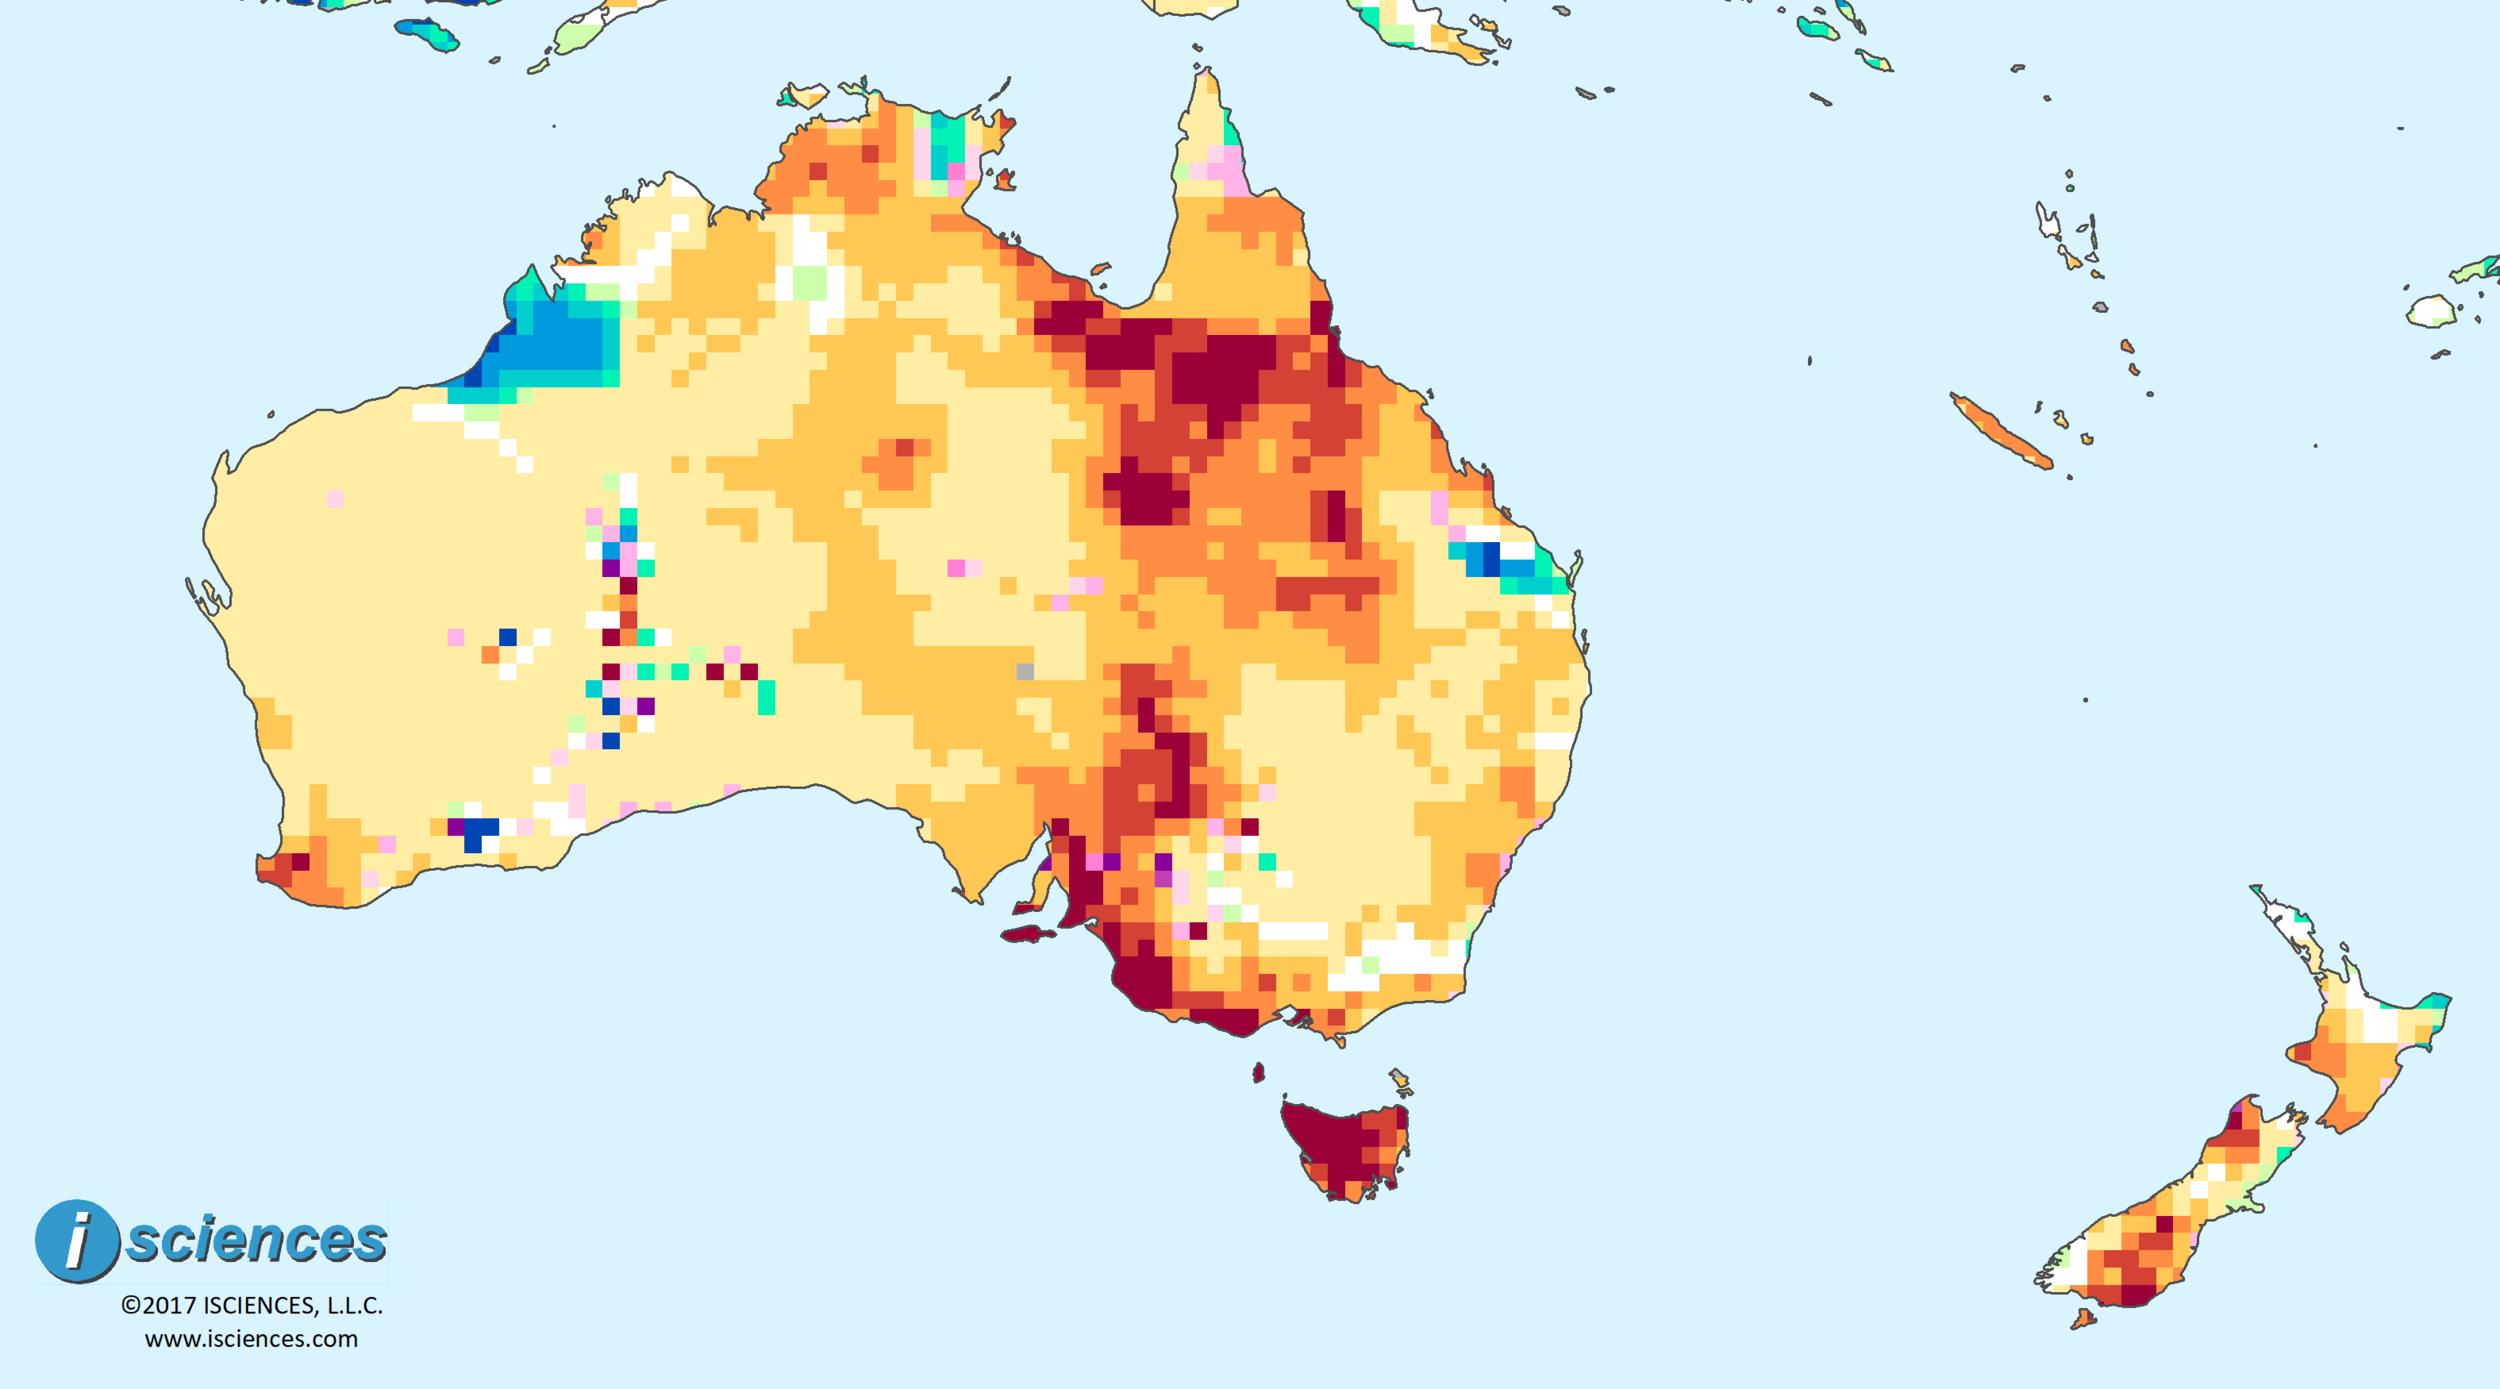 Australia & New Zealand: Intense water deficits persist in